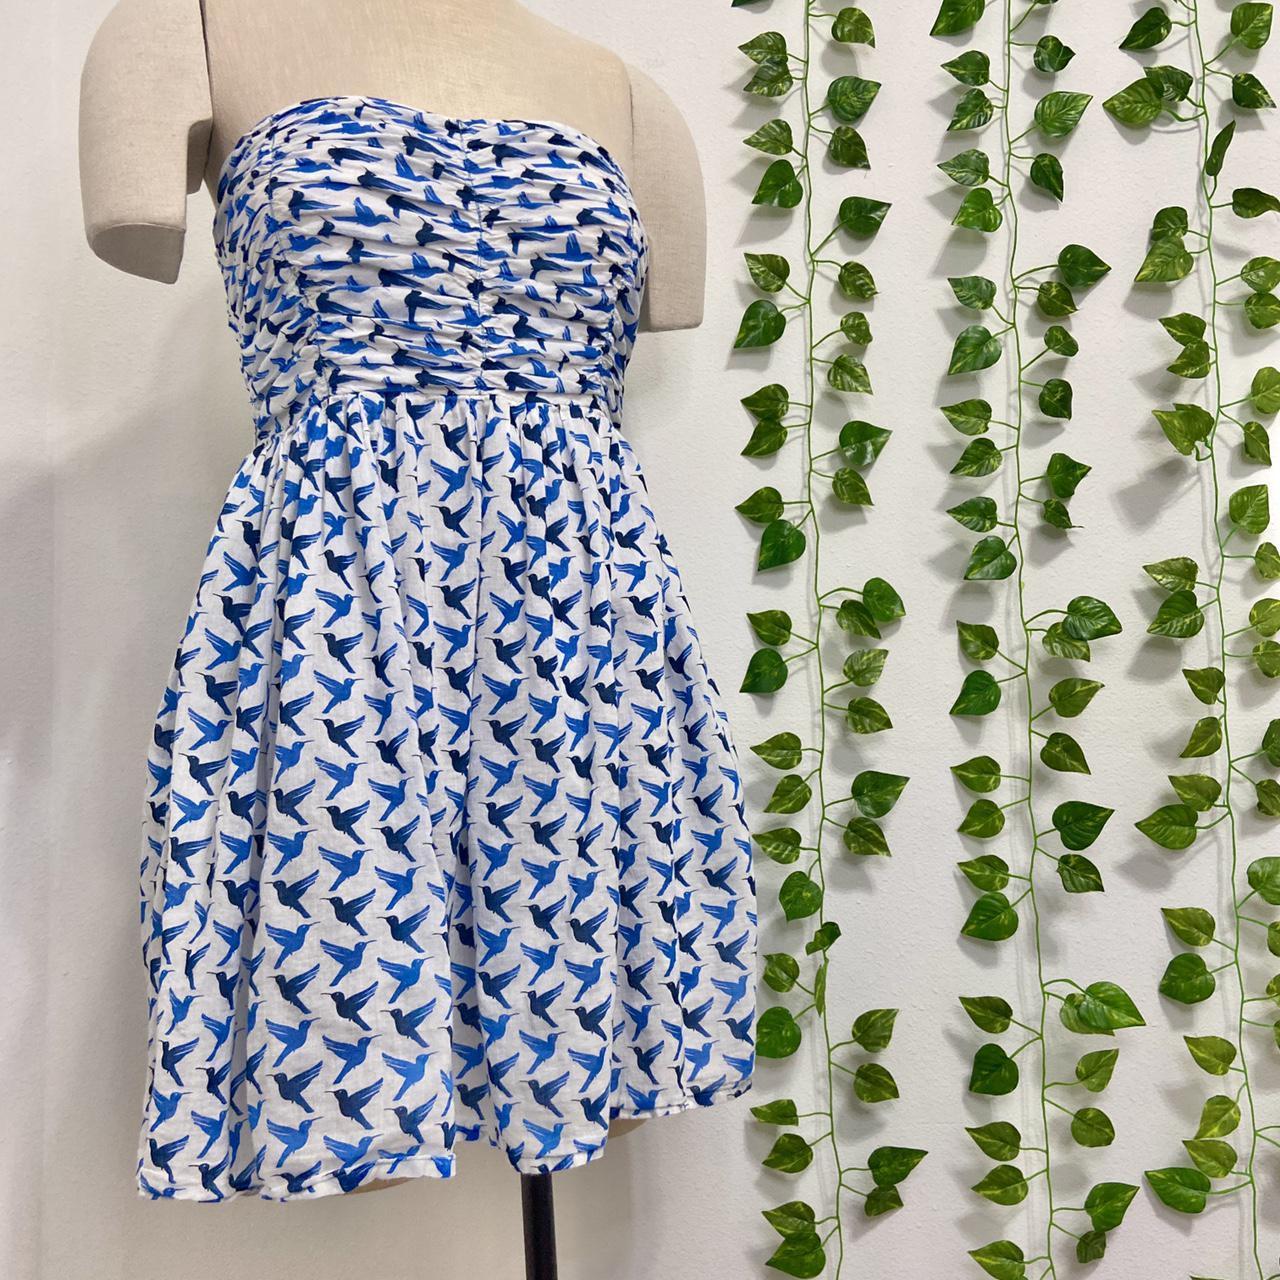 Product Image 1 - Zara TRF Blue Birds Strapless